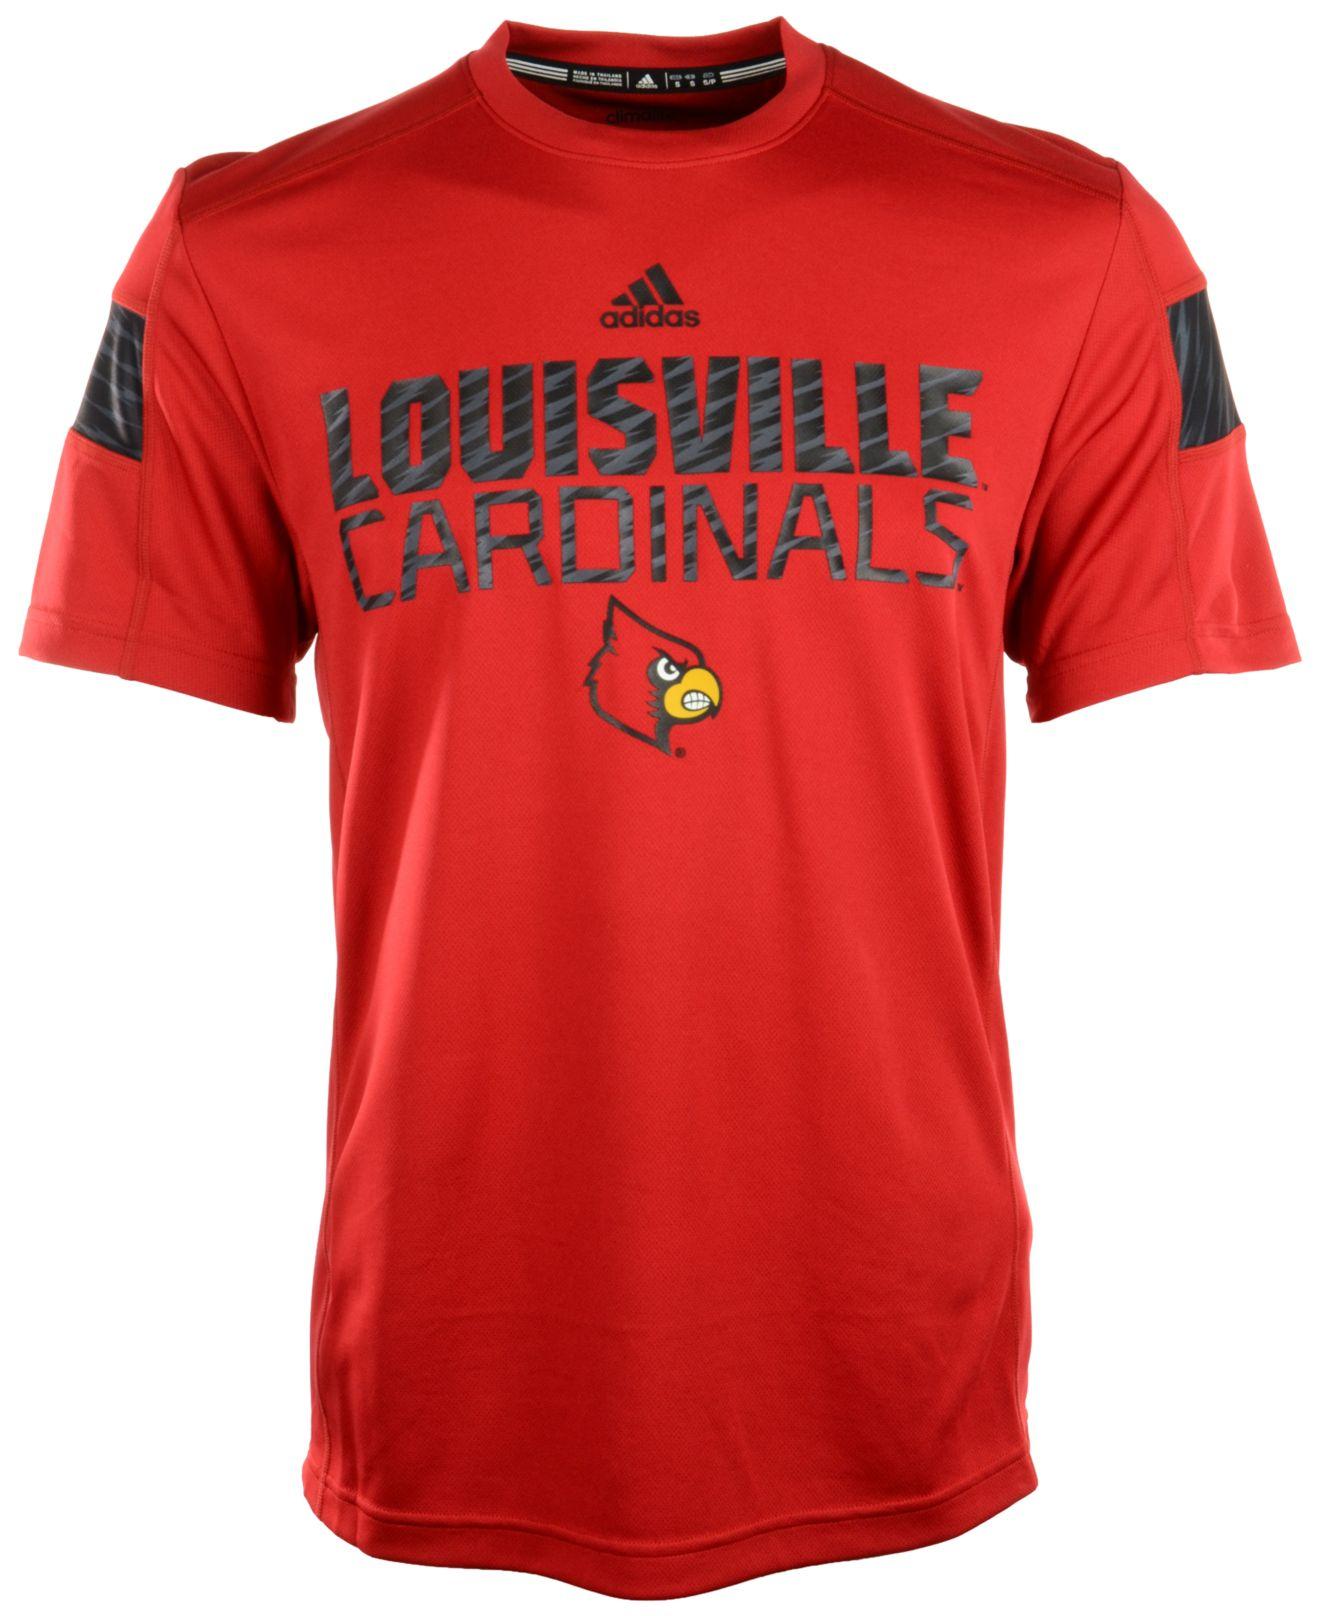 Adidas men 39 s louisville cardinals sideline player t shirt for Louisville t shirt printing